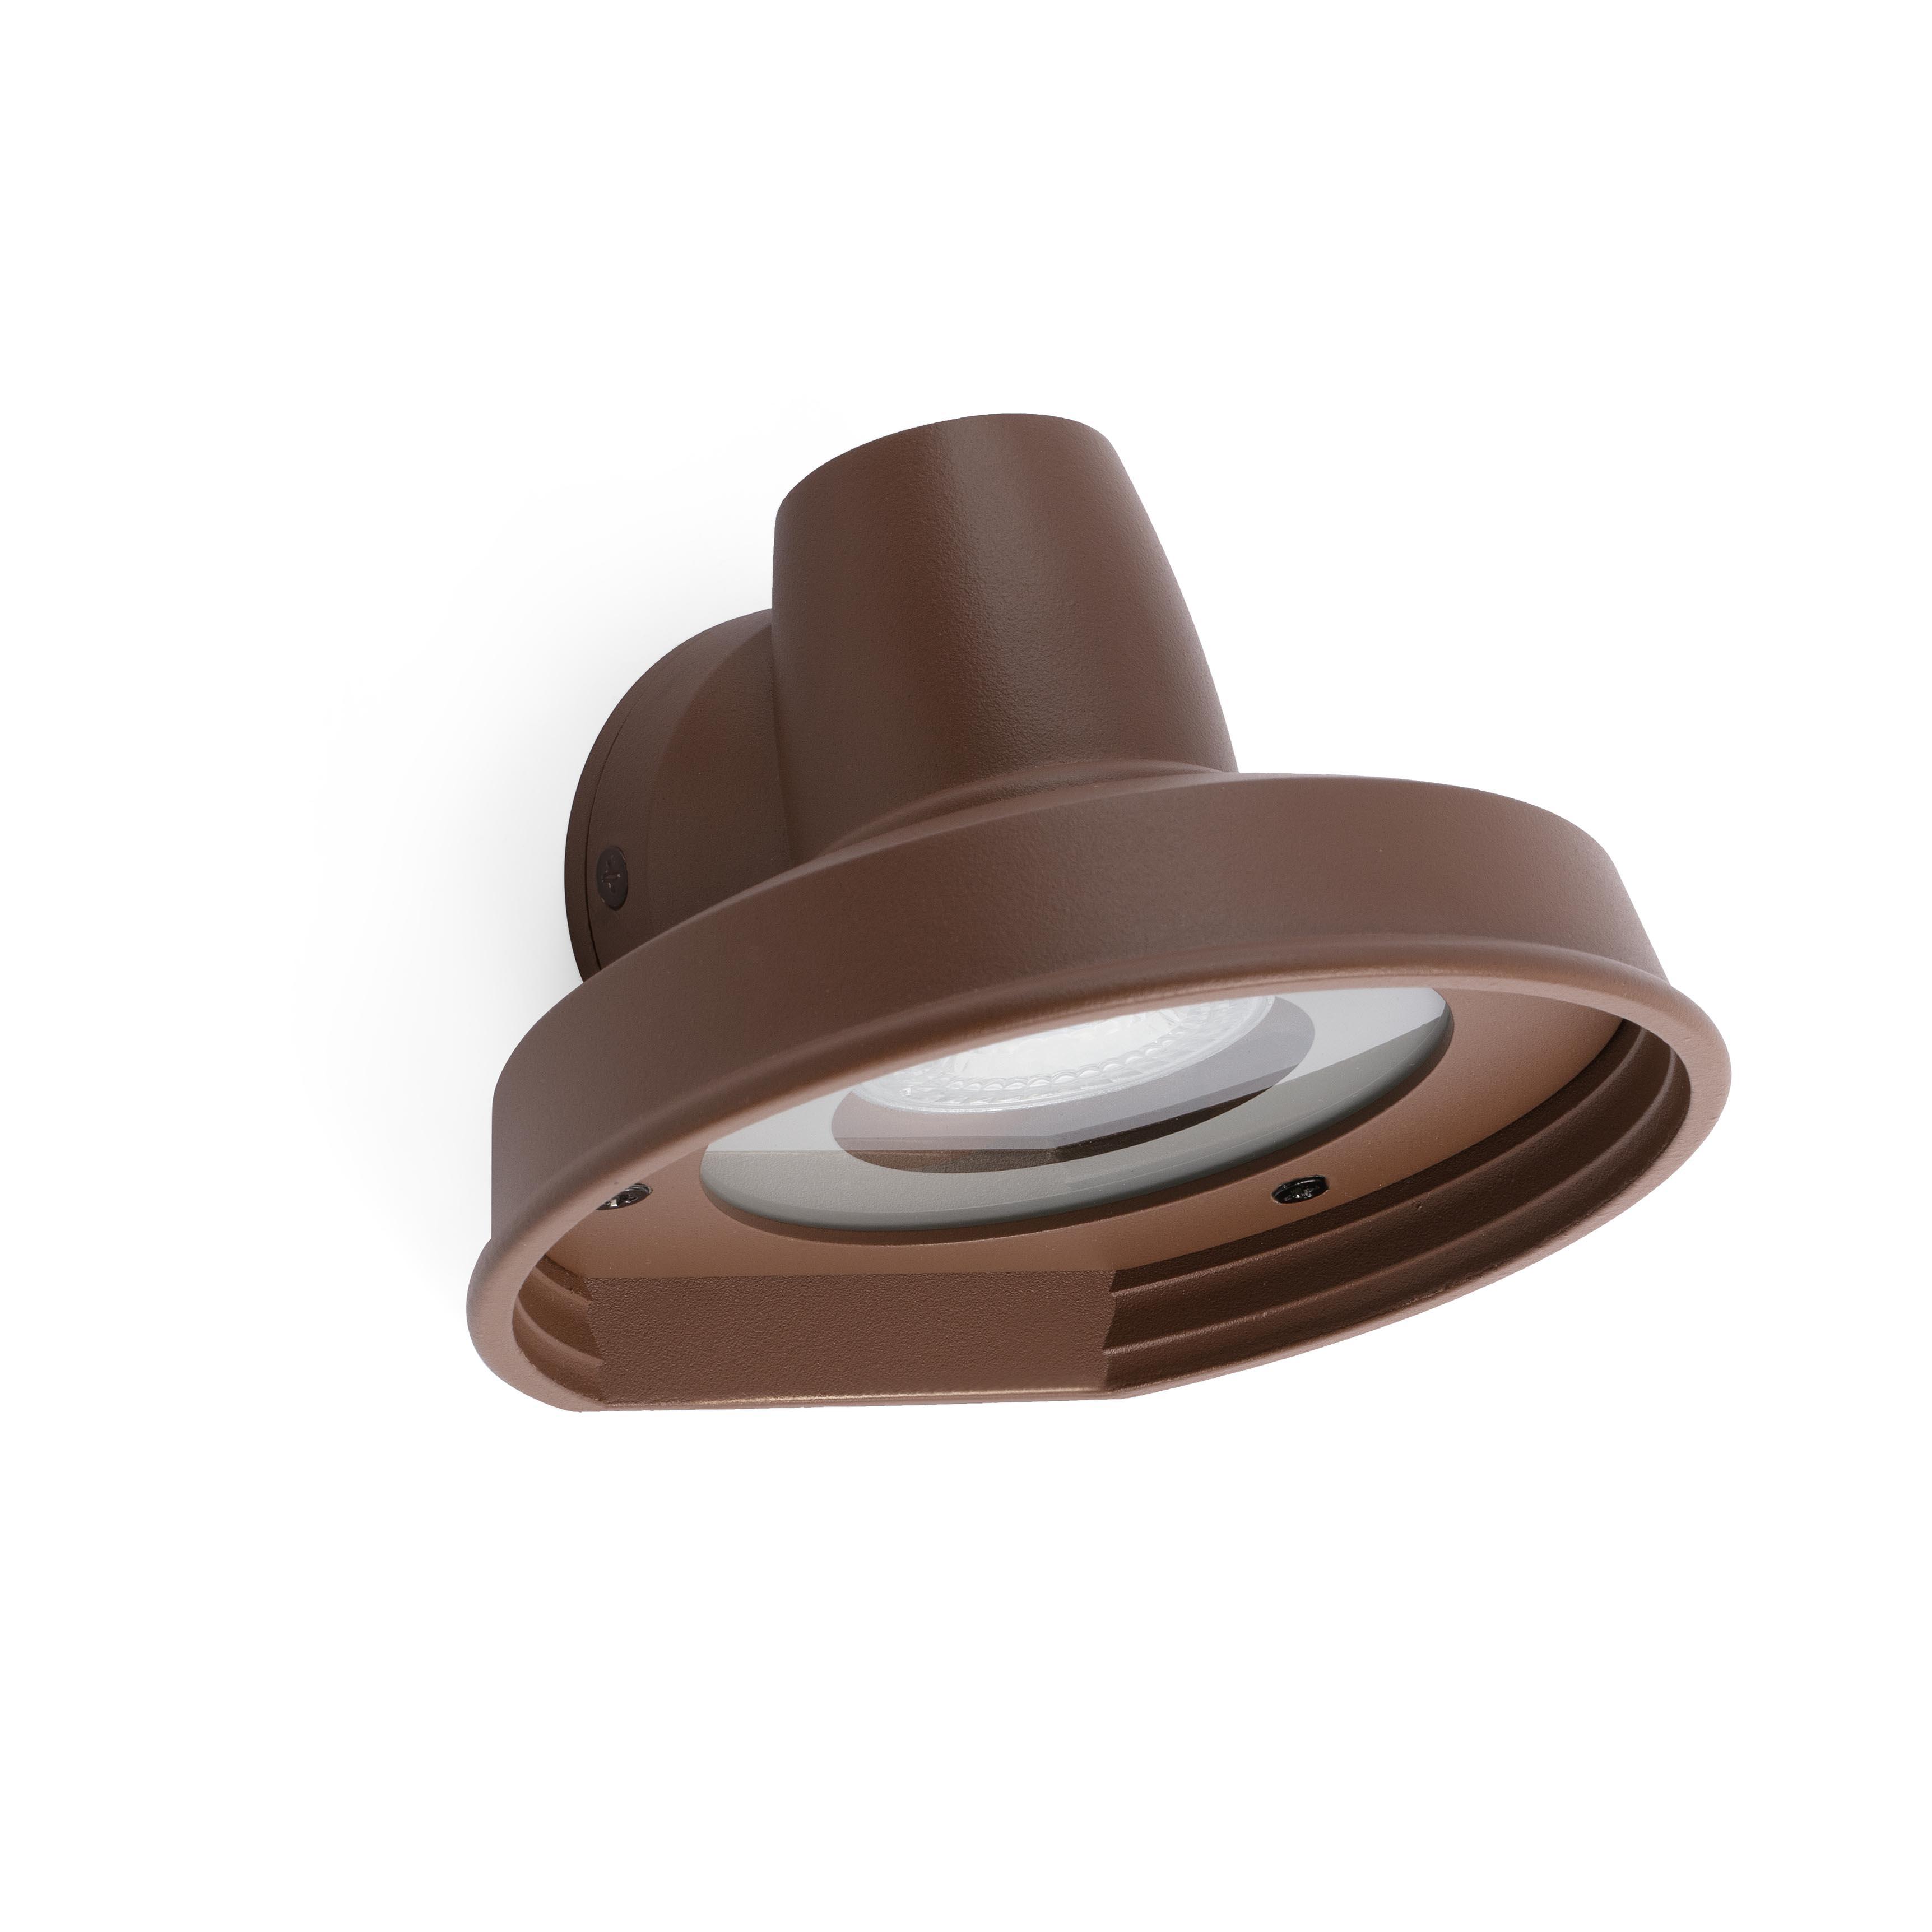 Applique BRONX LED 8 Watt